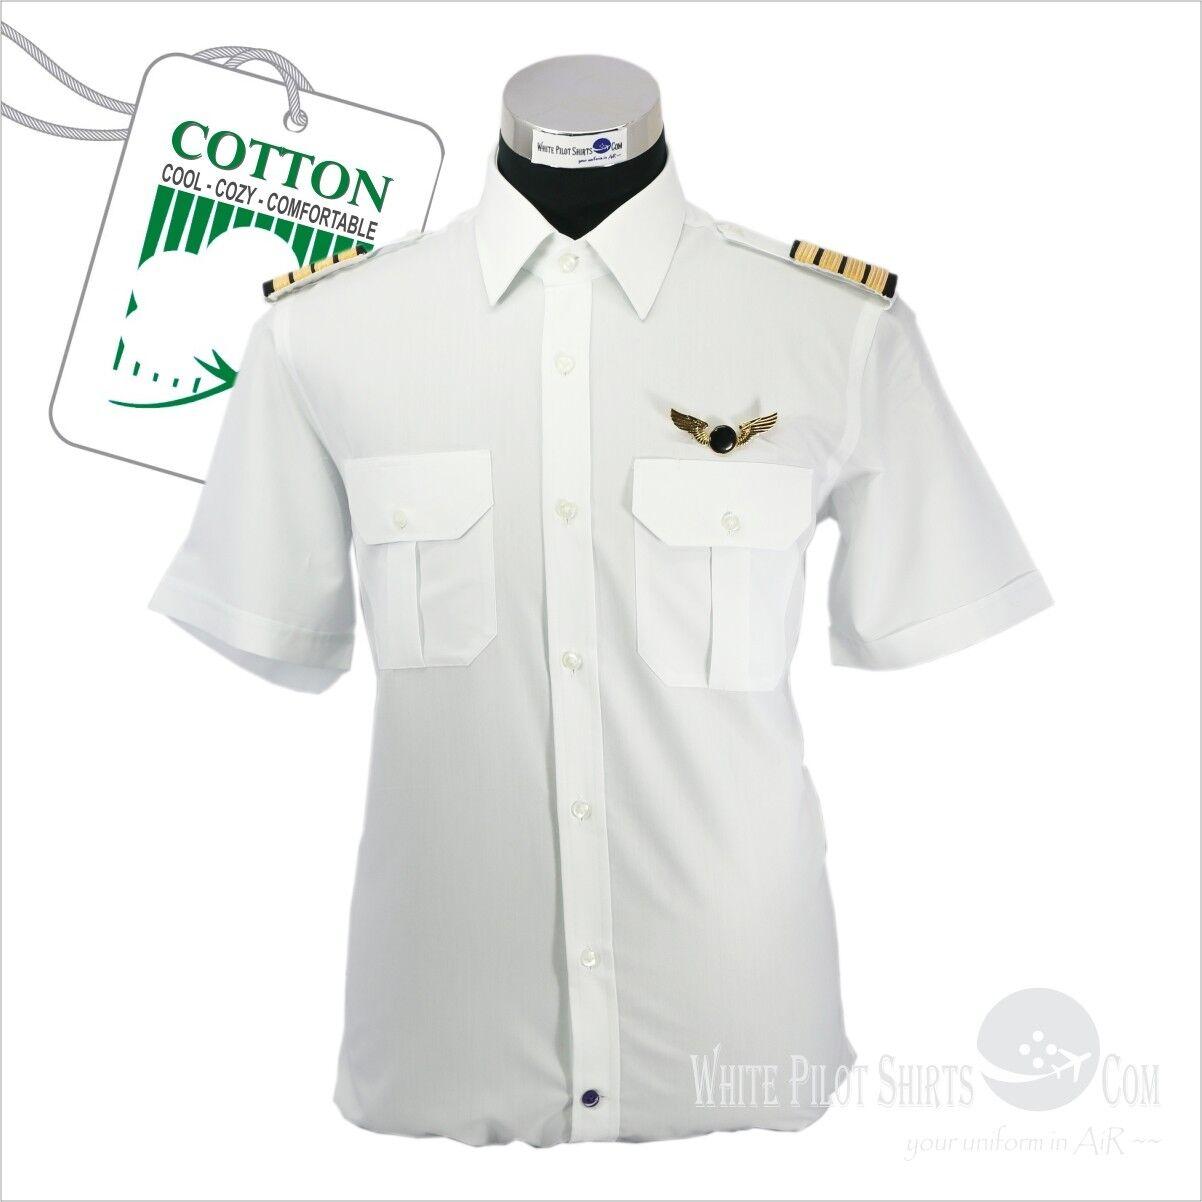 Weiß Pilot Shirts 100% Cotton Aviator Uniformen Airmen Sicherheit Luftfahrt